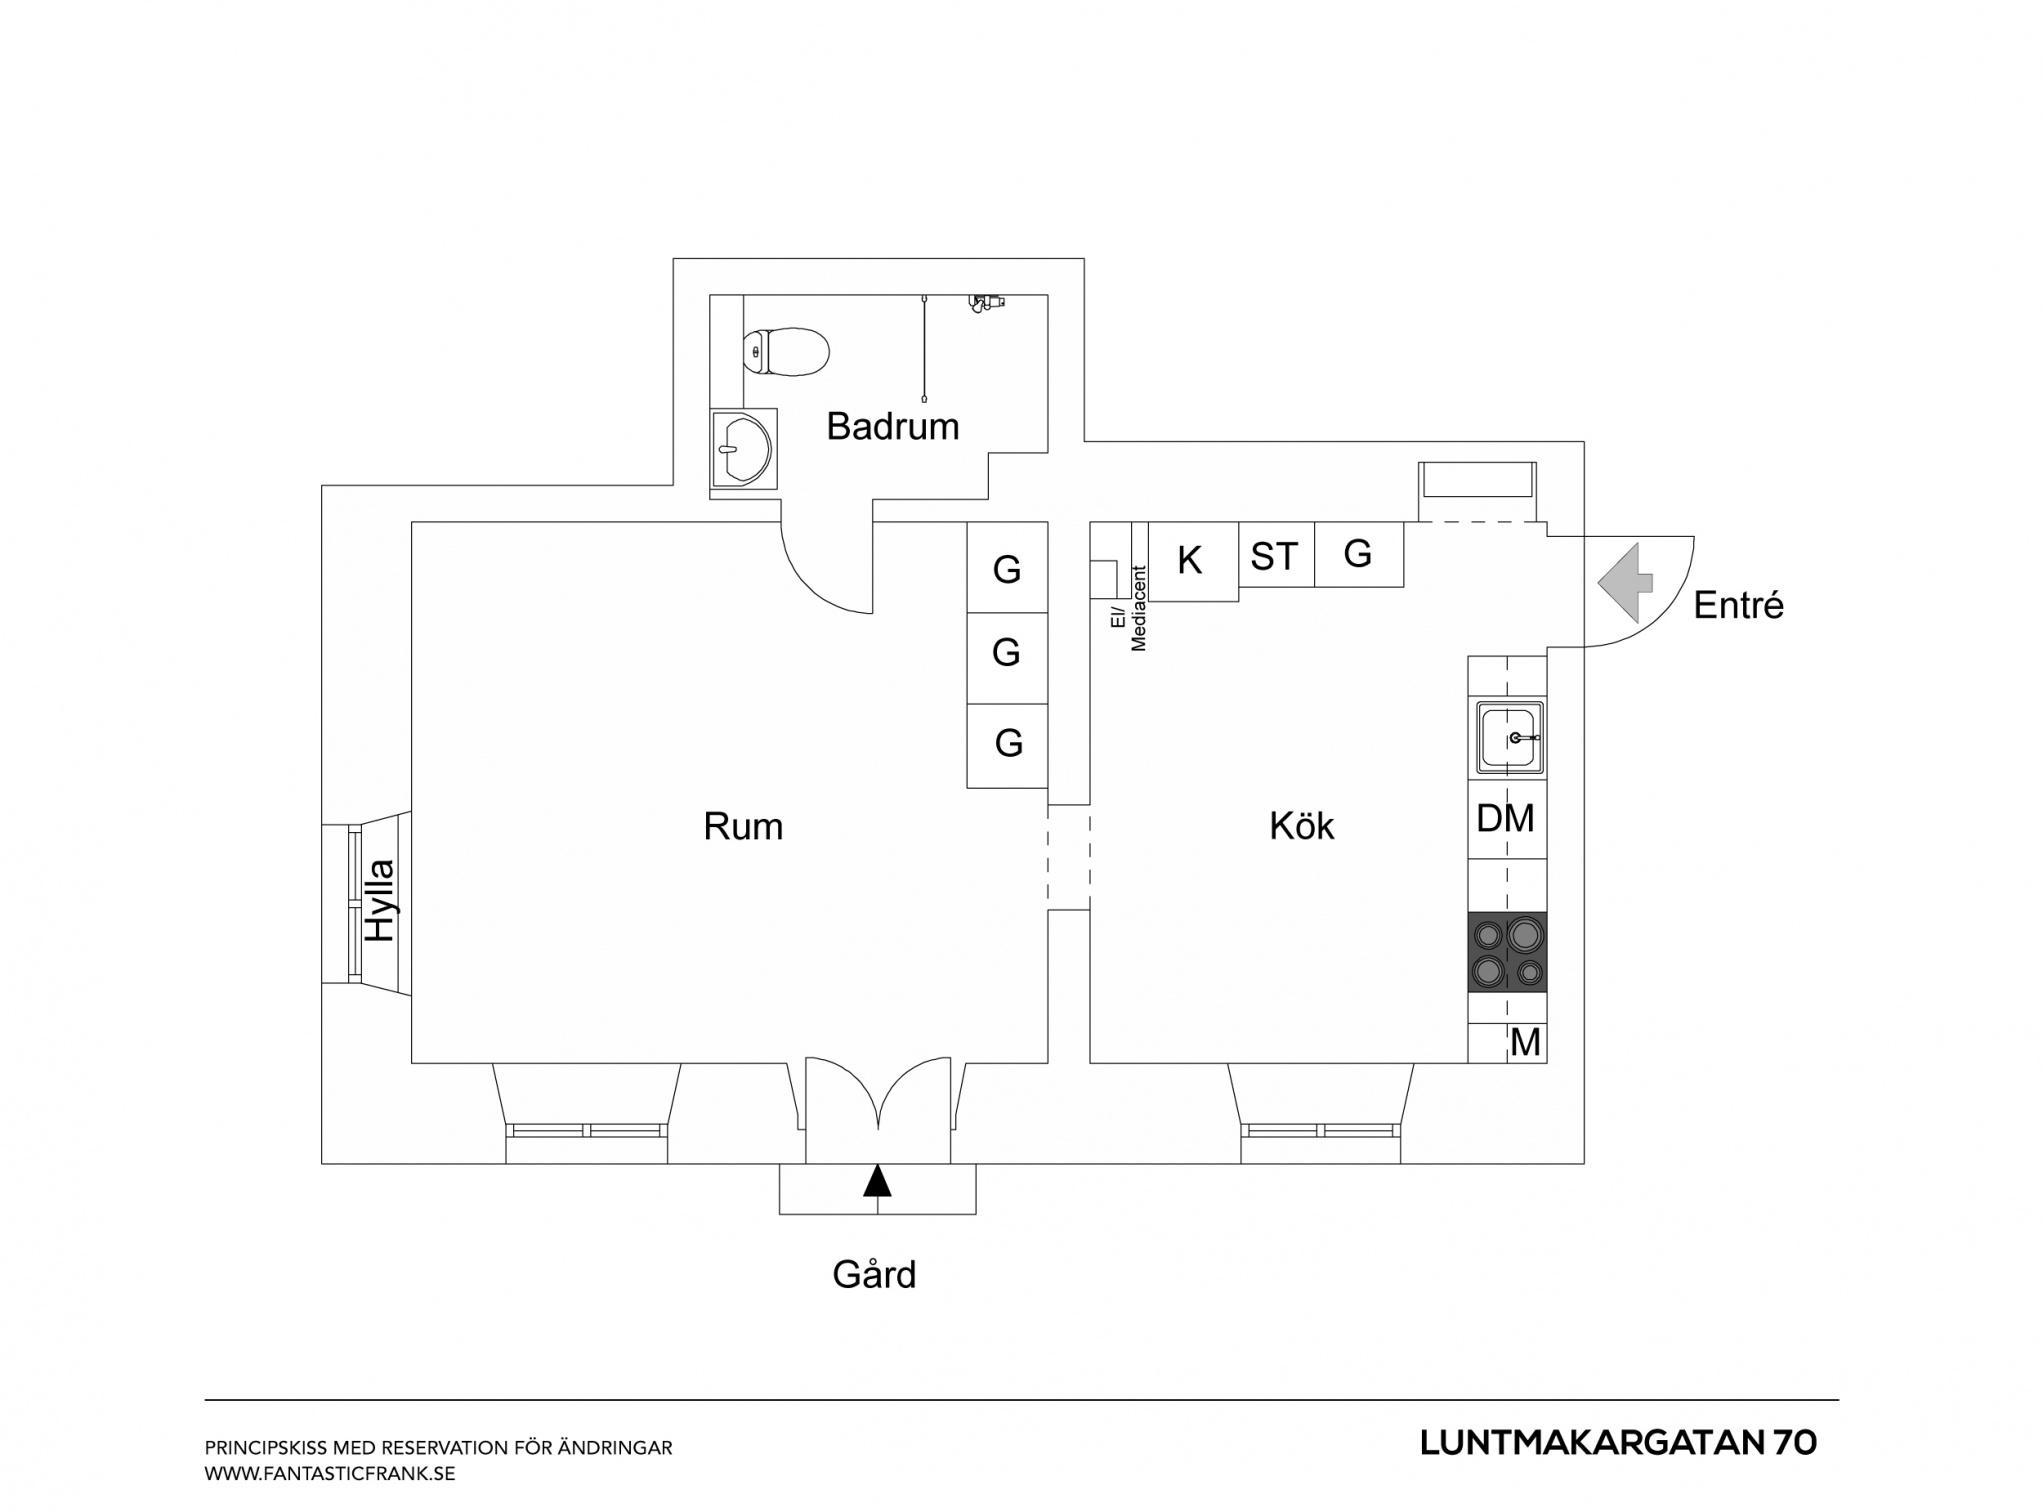 Floorplan of small Stockholm apartment